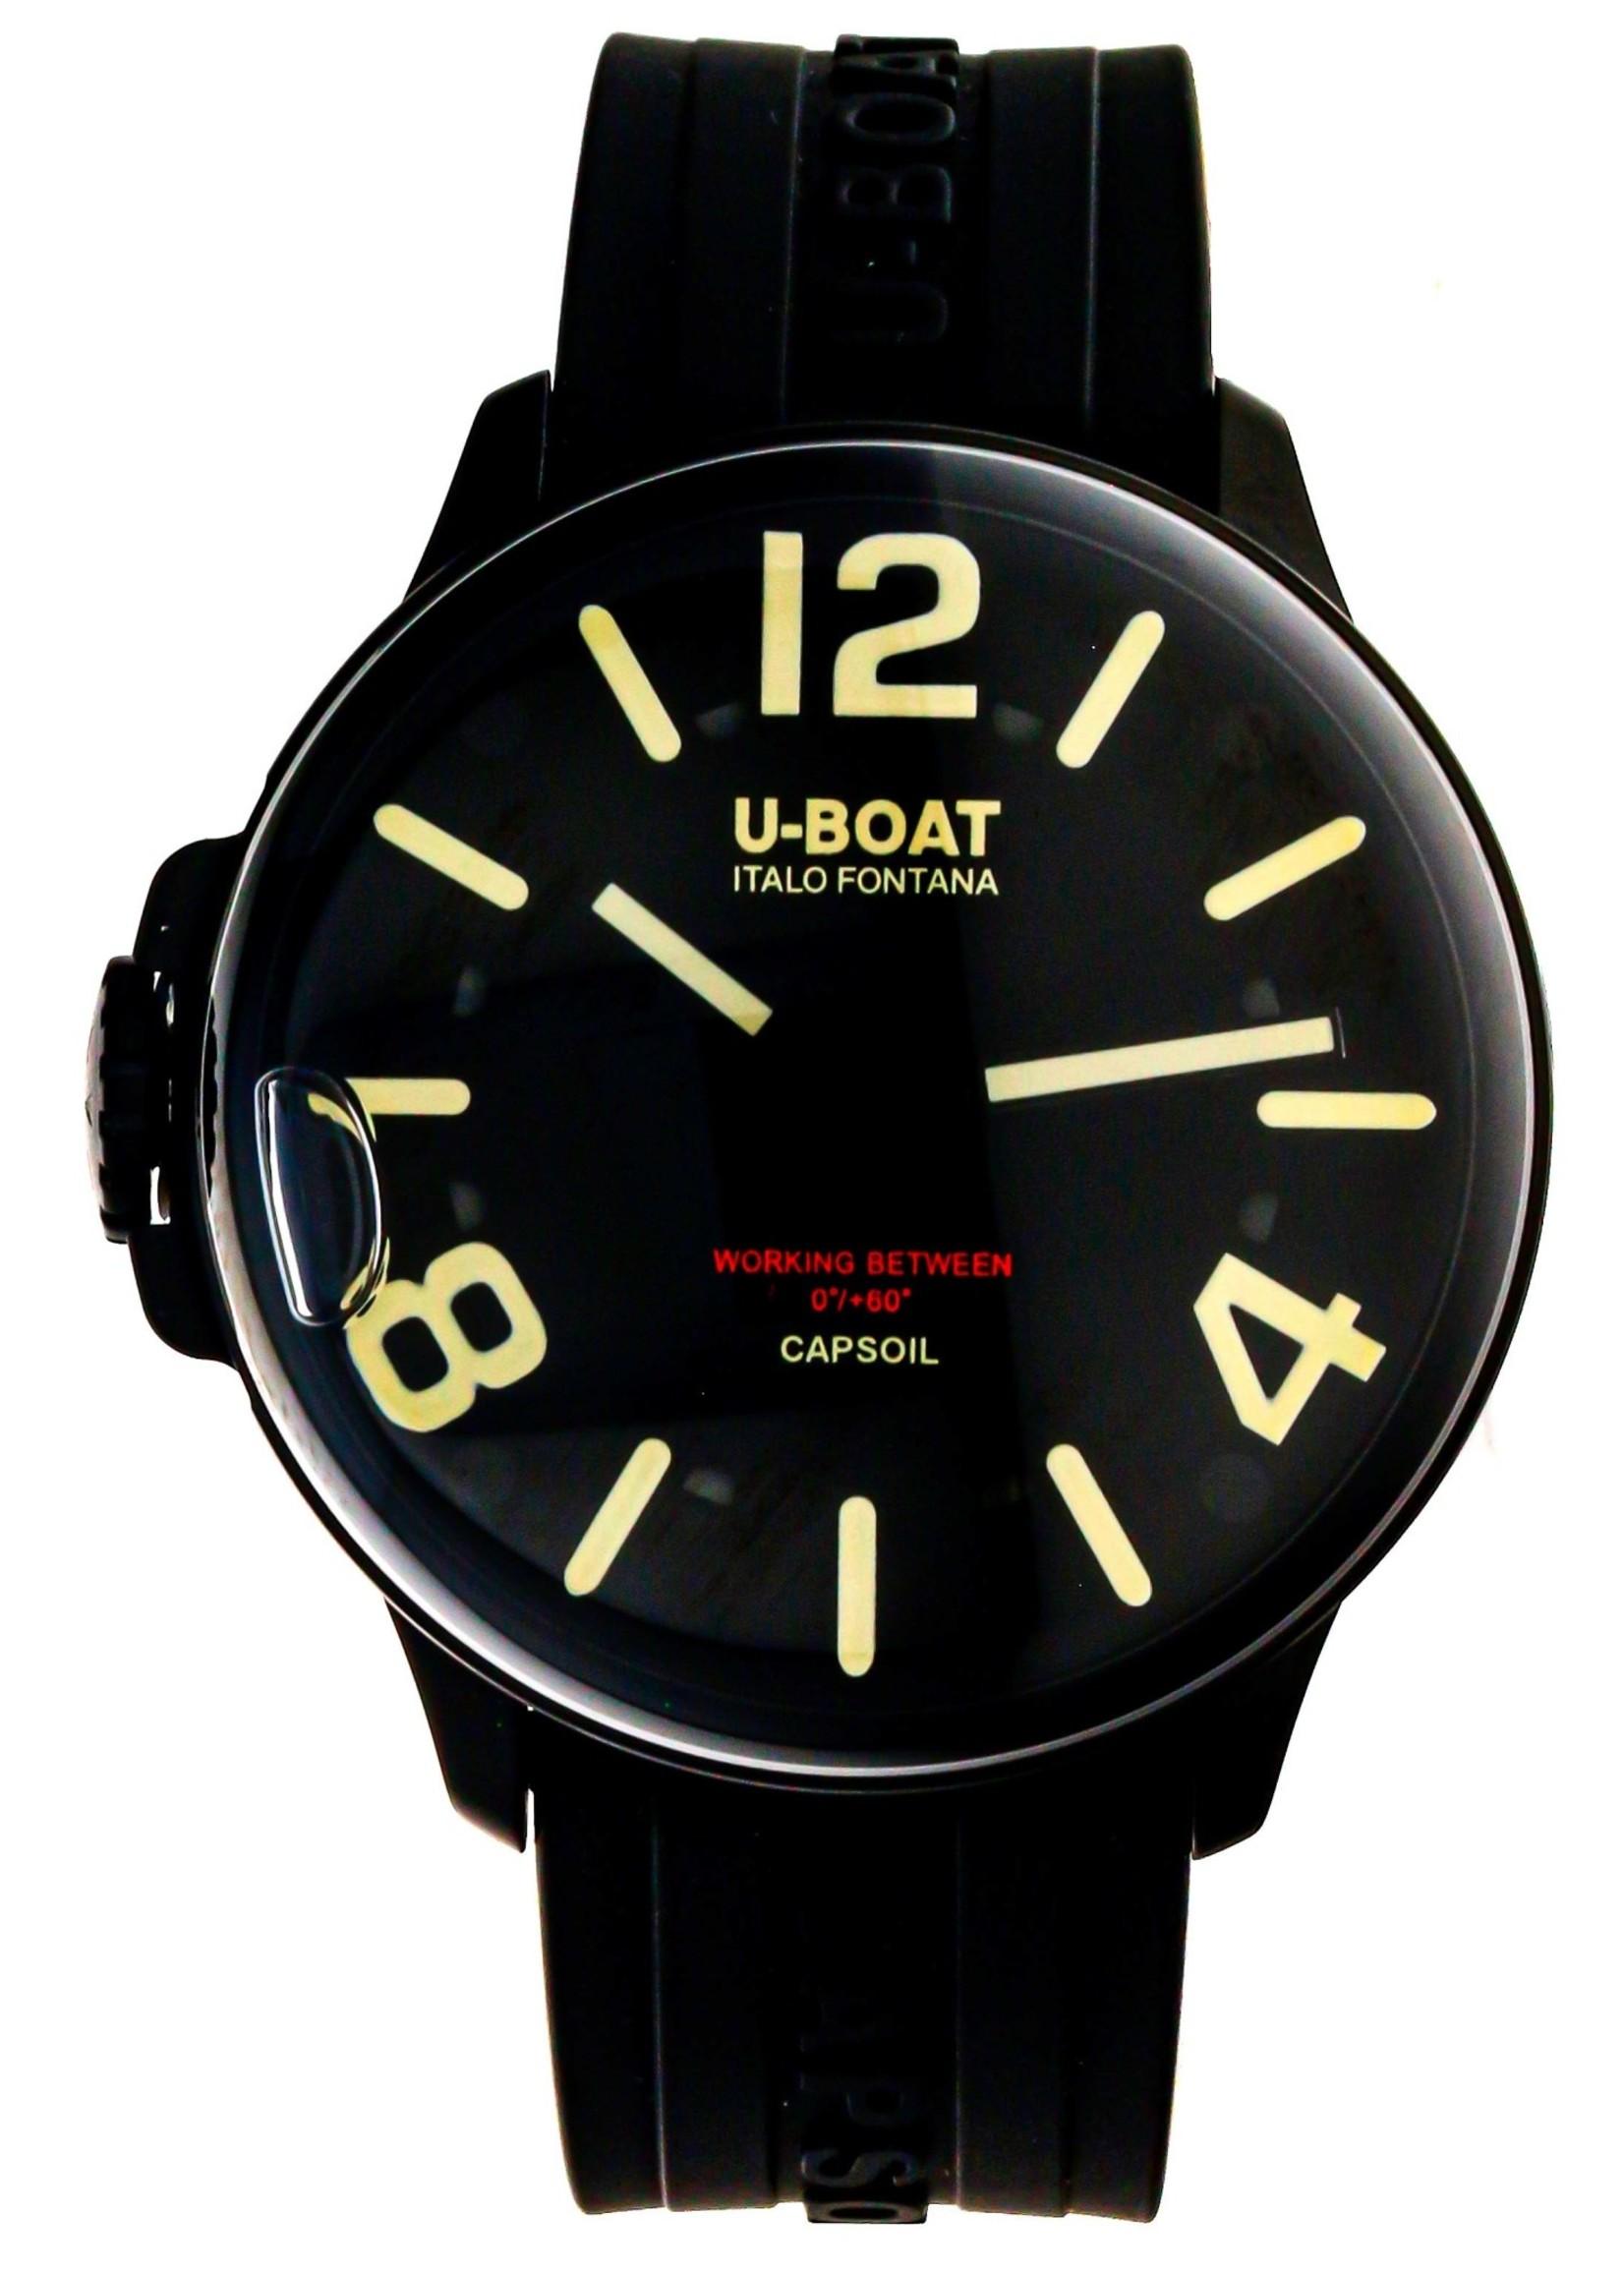 U-BOAT U-BOAT CAPSOIL (2020 B+P) #8108/A DLC